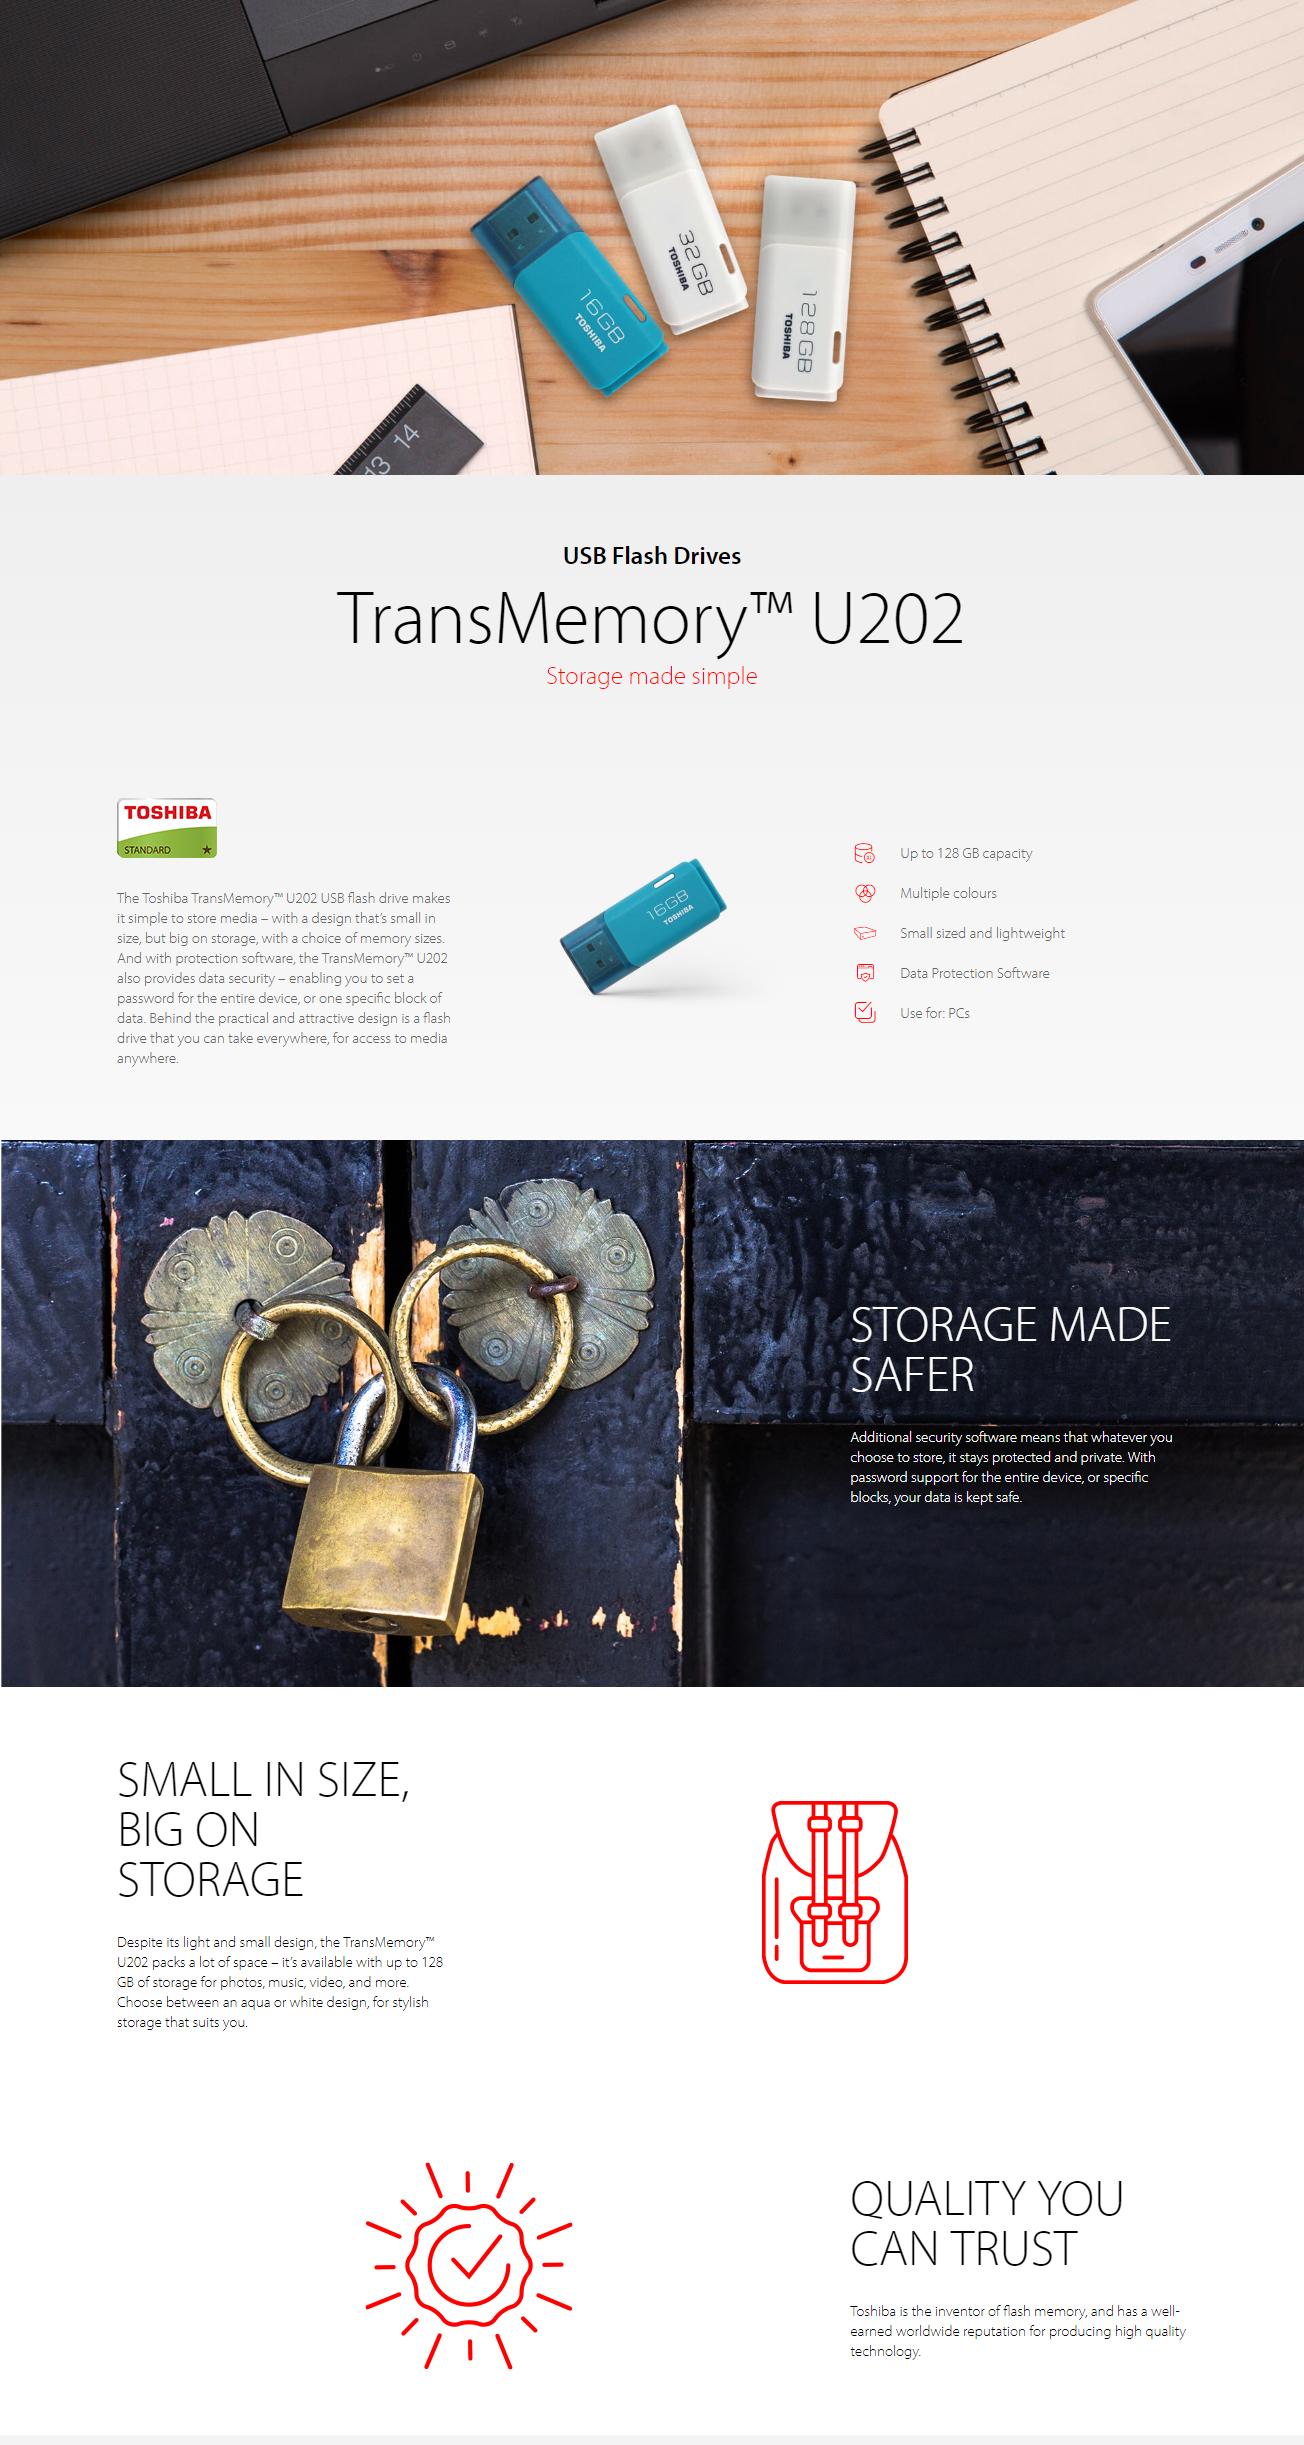 Toshiba Hayabusa U202 16gb Usb Flash Drive White Lazada Ph Disk Transmemory Original Specifications Of